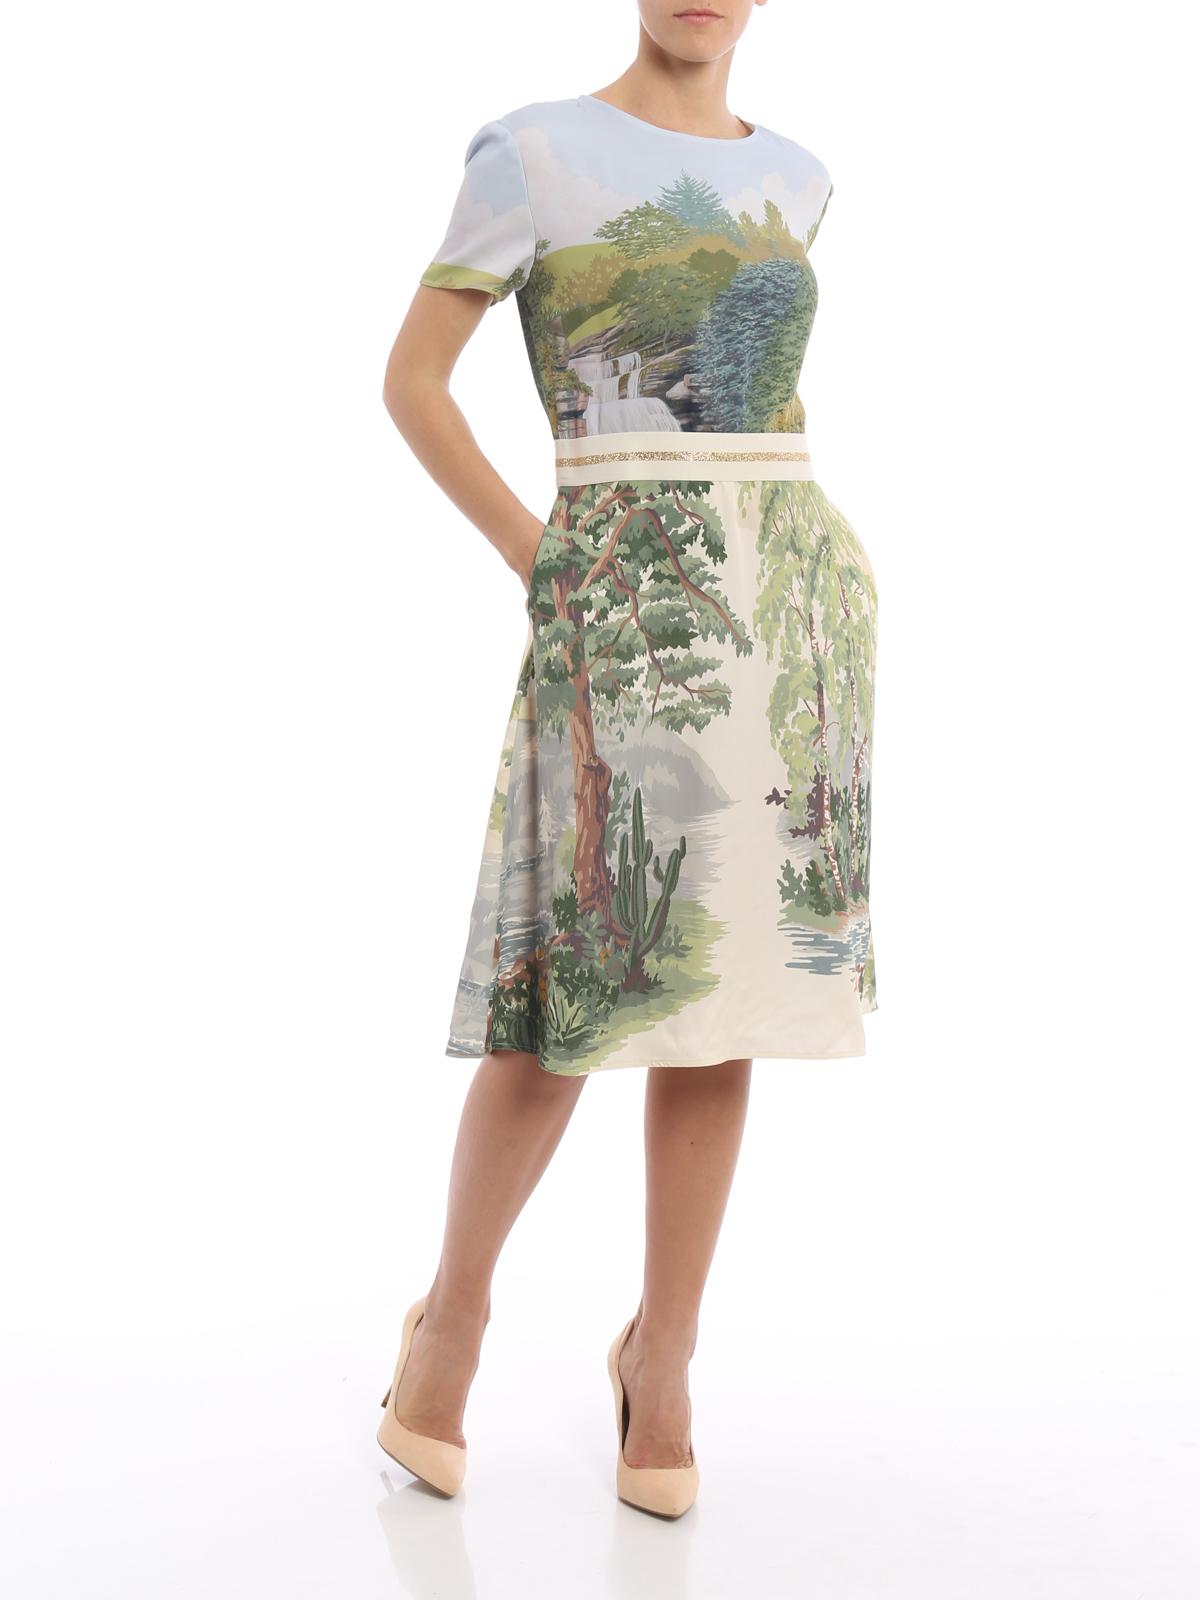 Stella Mccartney Landscape Print Viscose Dress Knee